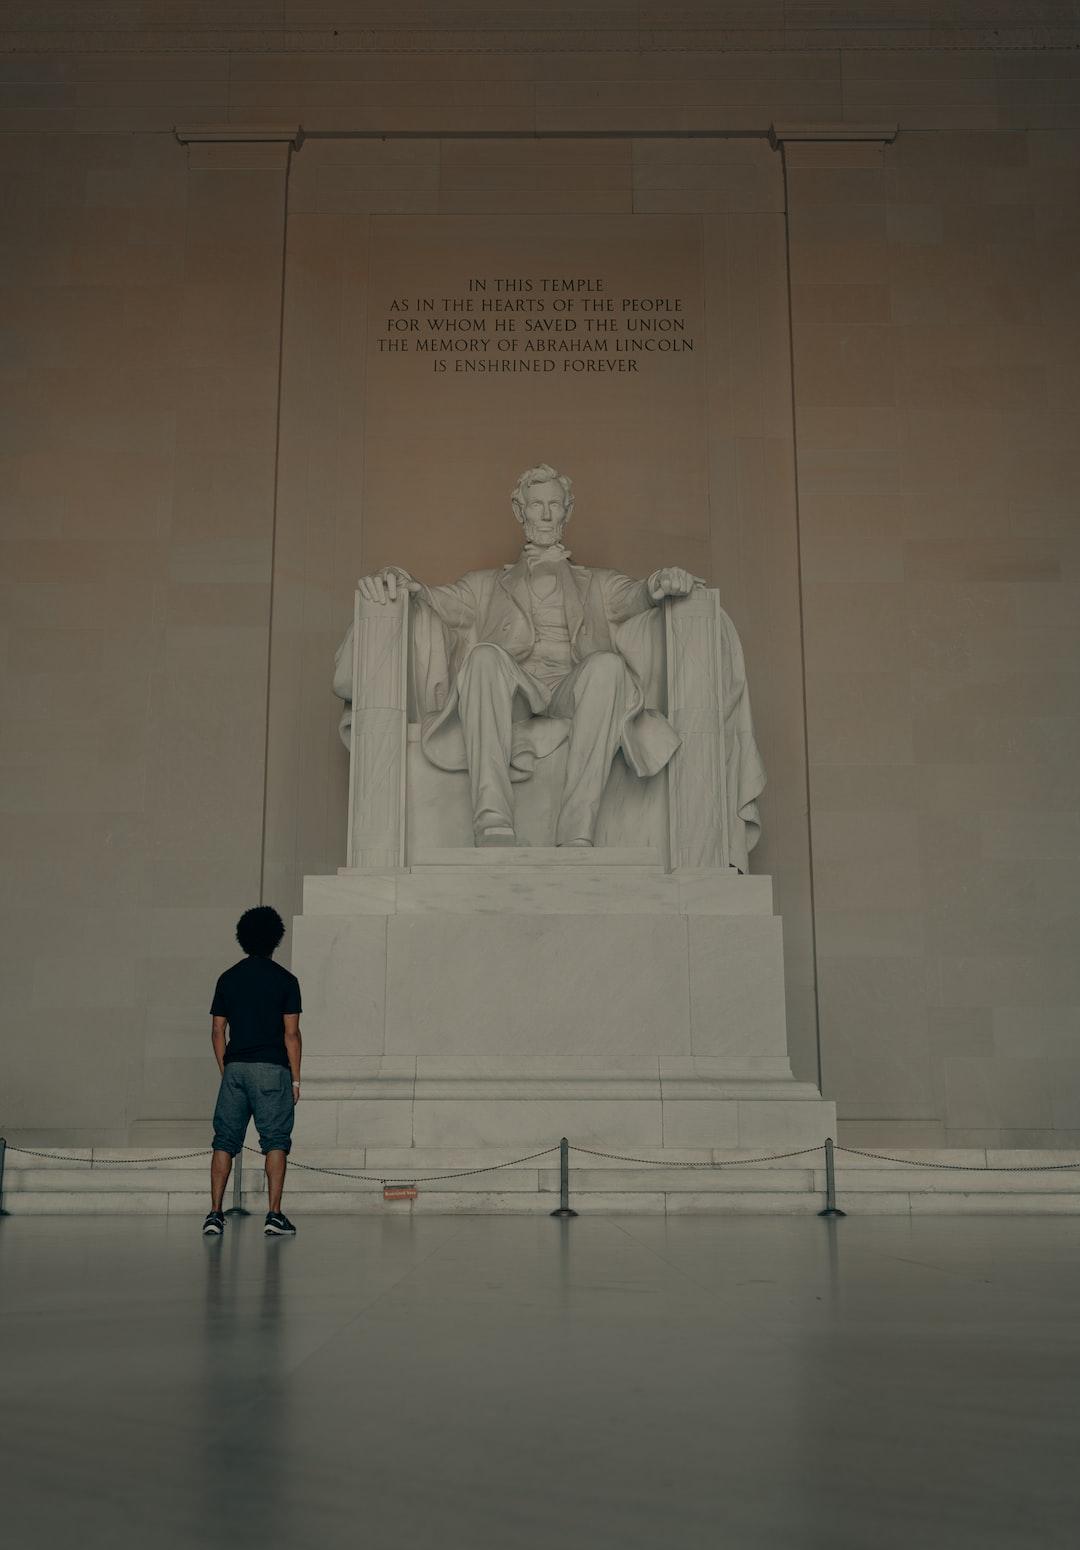 Admiring Honest Abe (IG: @clay.banks)